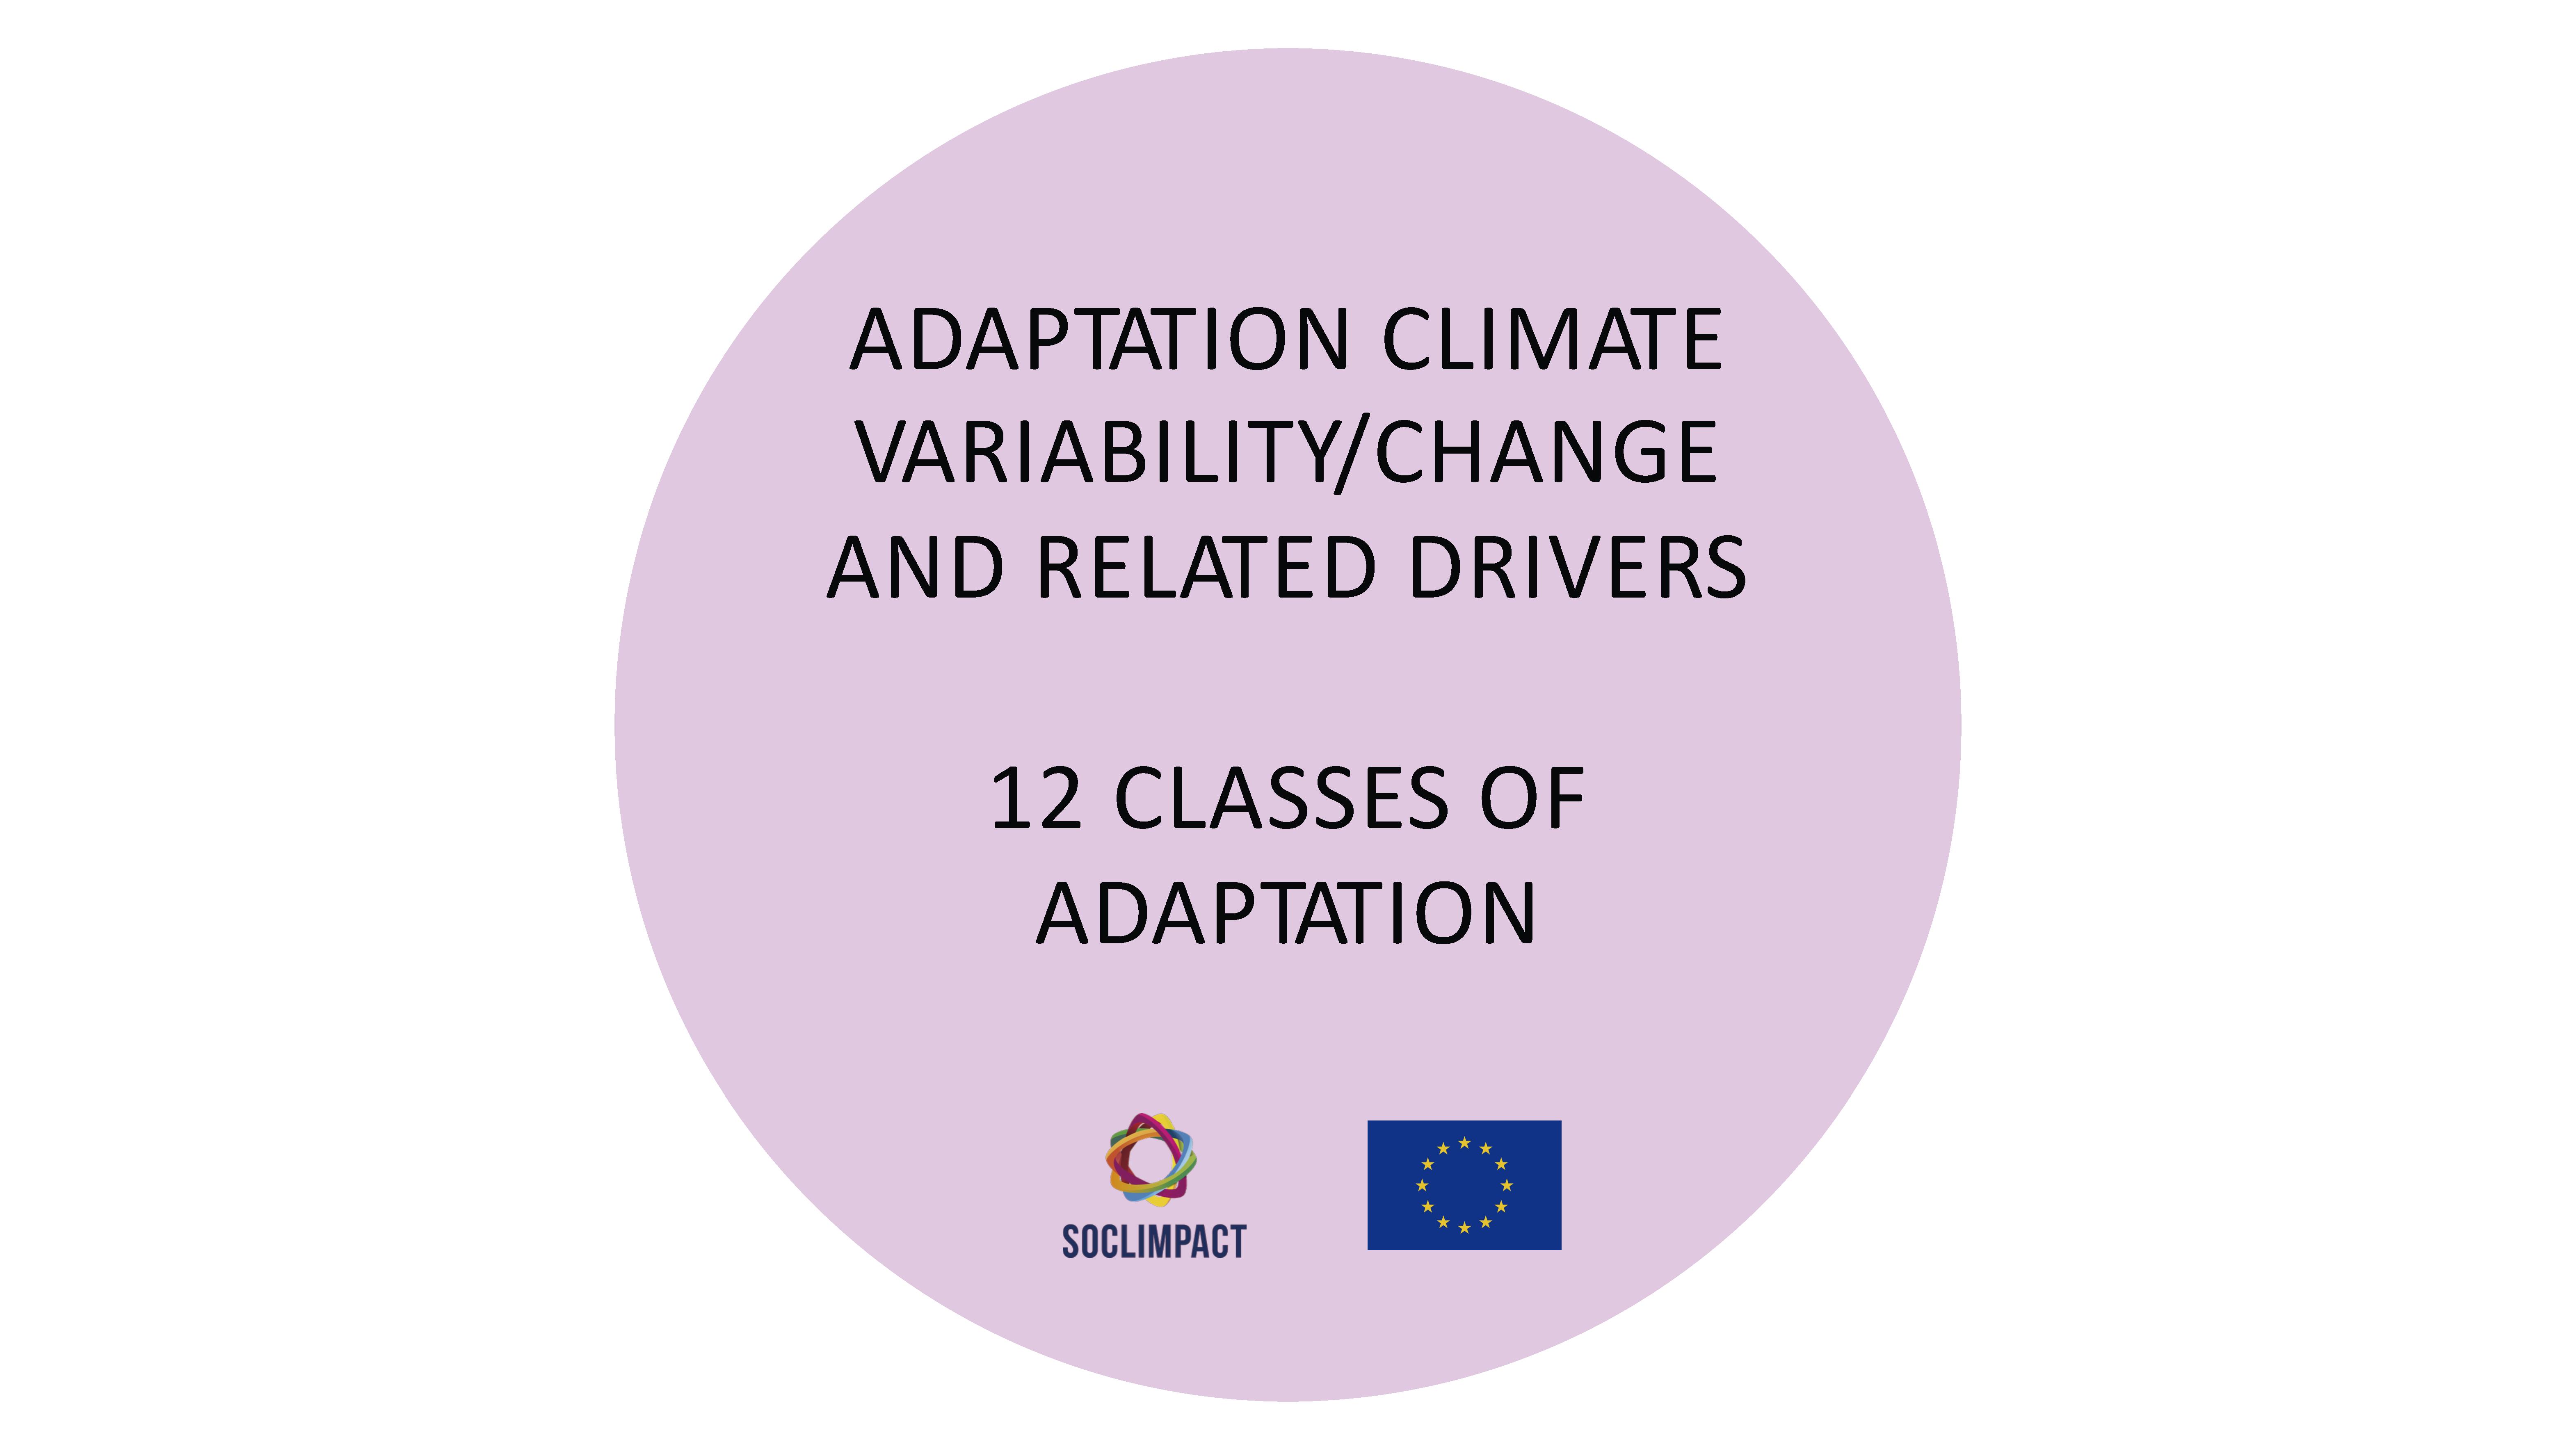 Classes of Adaptation